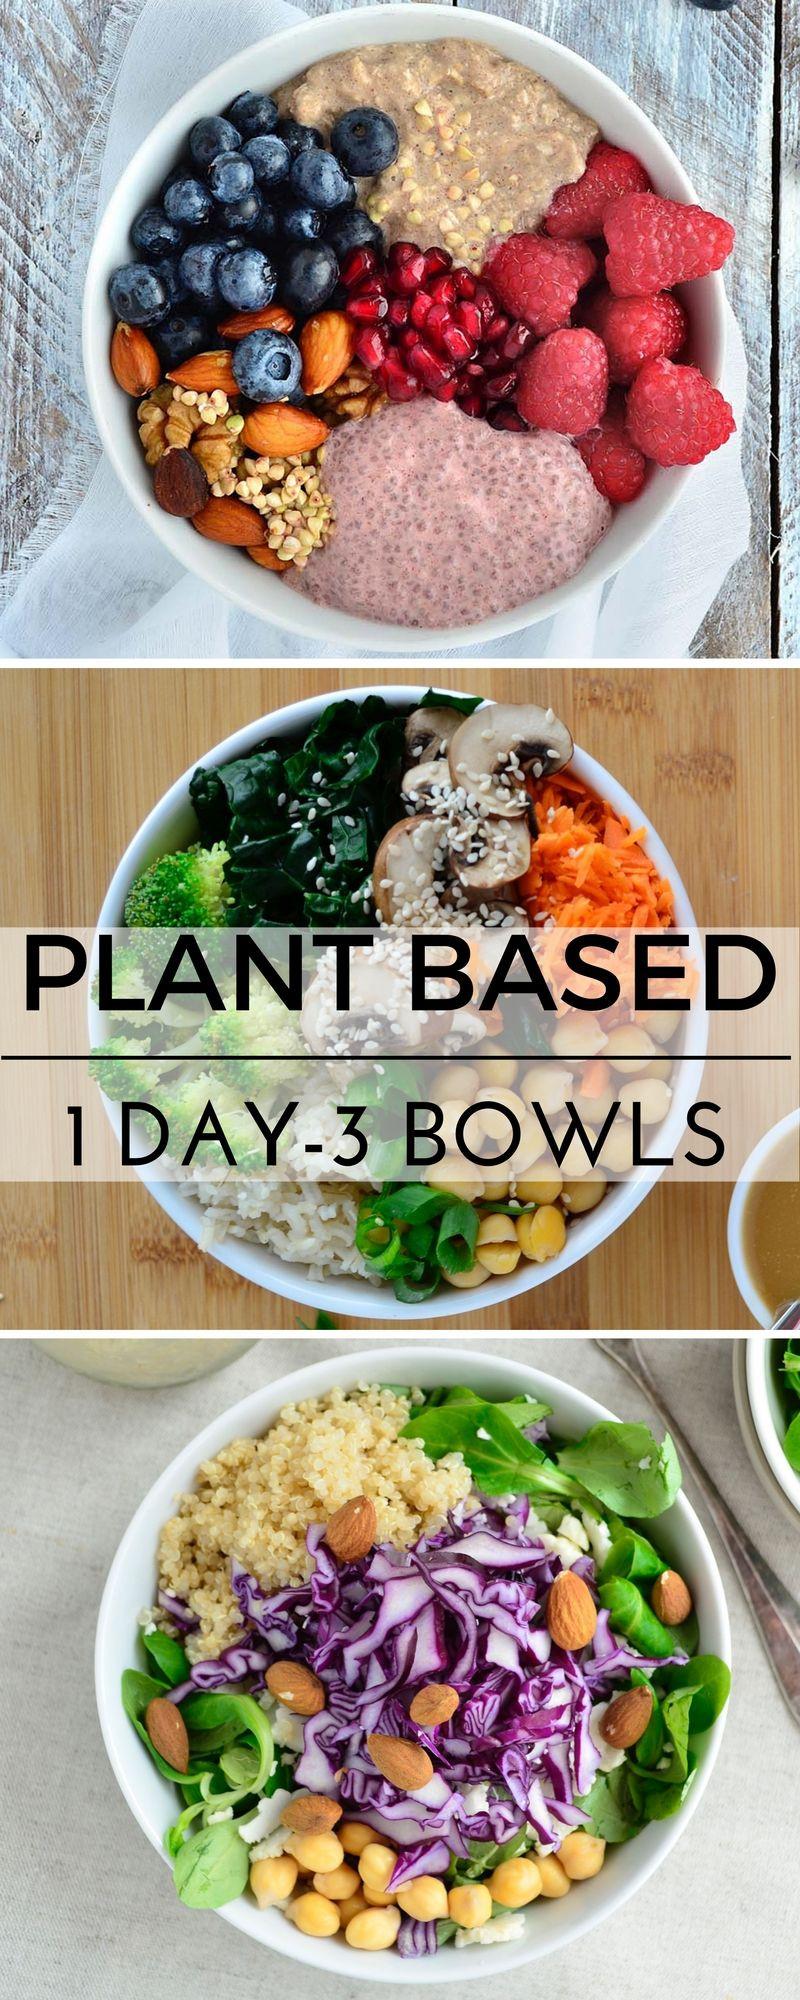 Plant Based Dinner Recipes  Plant based recipes vegan recipes healthy gluten free